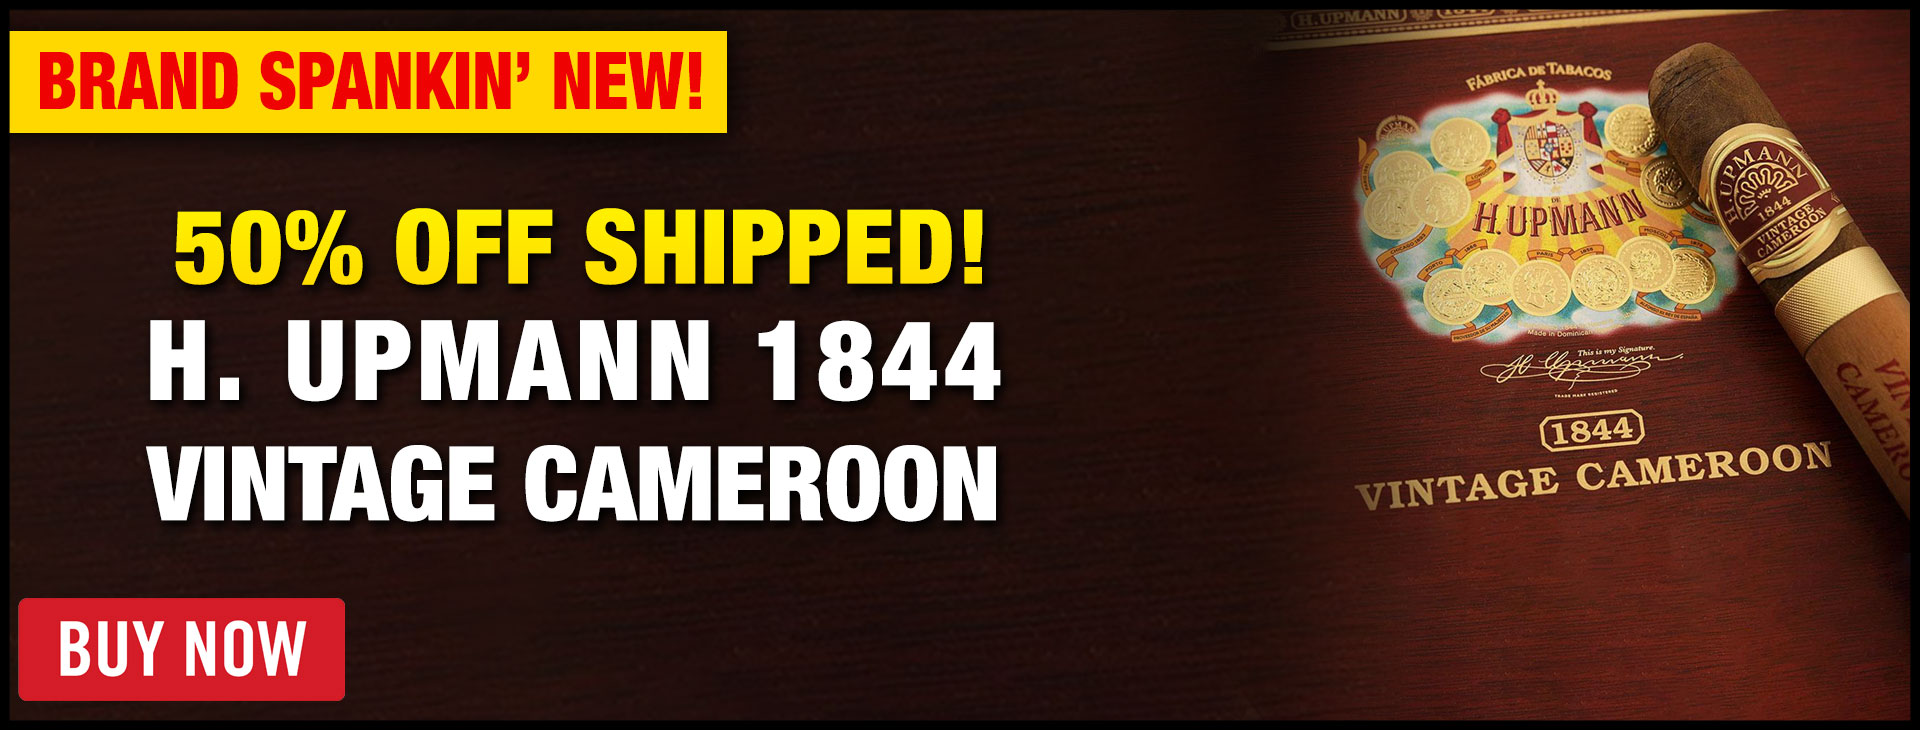 h-upmann-vintage-cameroon-2021-banner.jpg